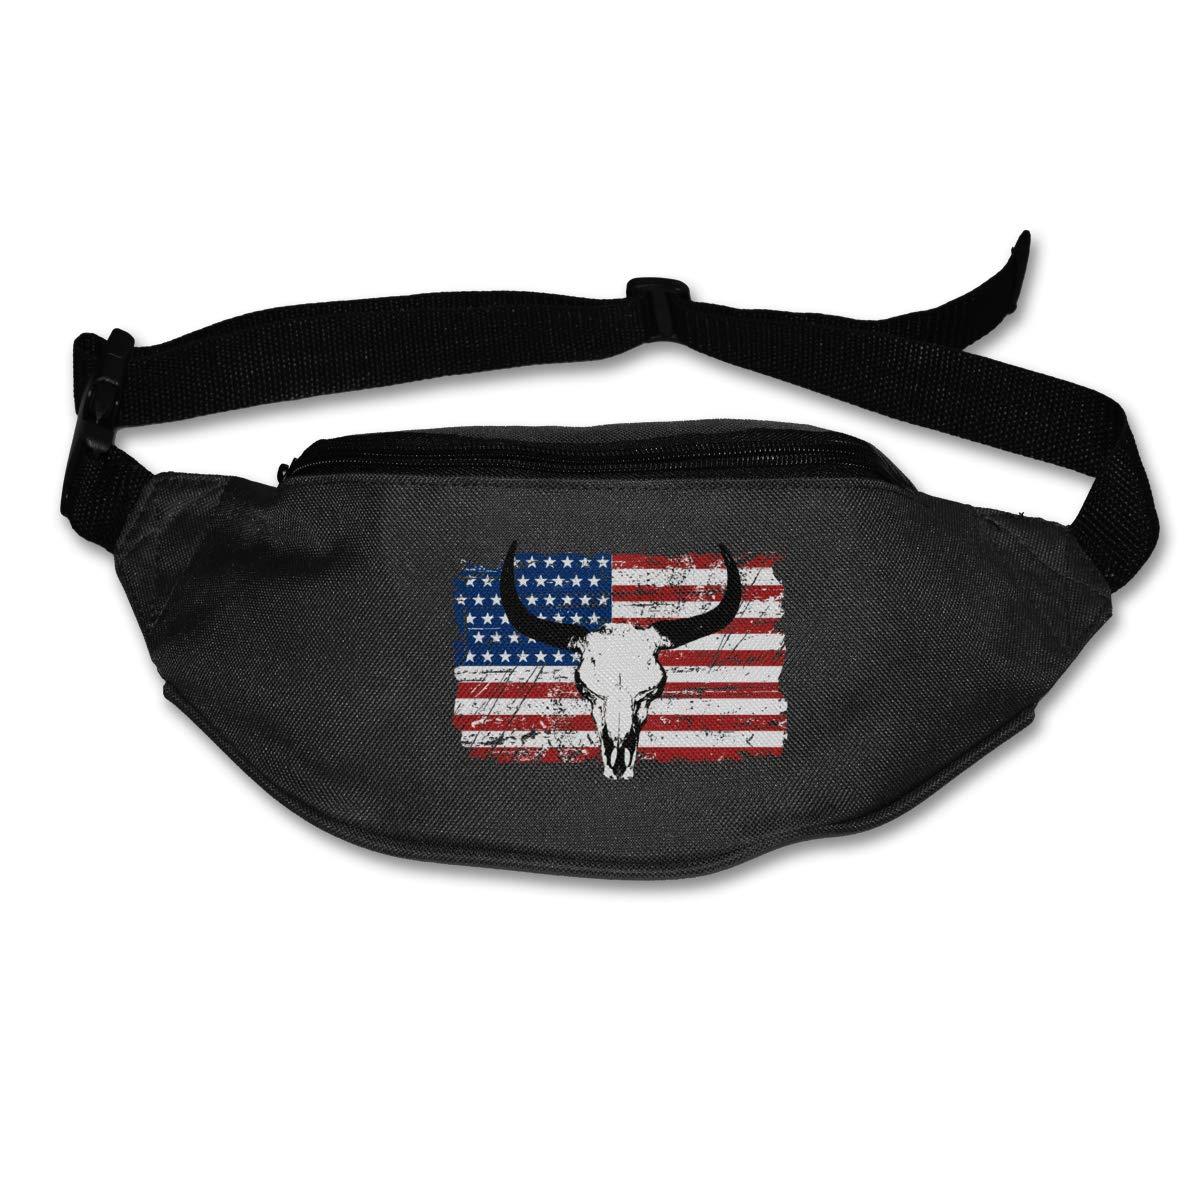 Cow Head US Flag Sport Waist Packs Fanny Pack Adjustable For Travel